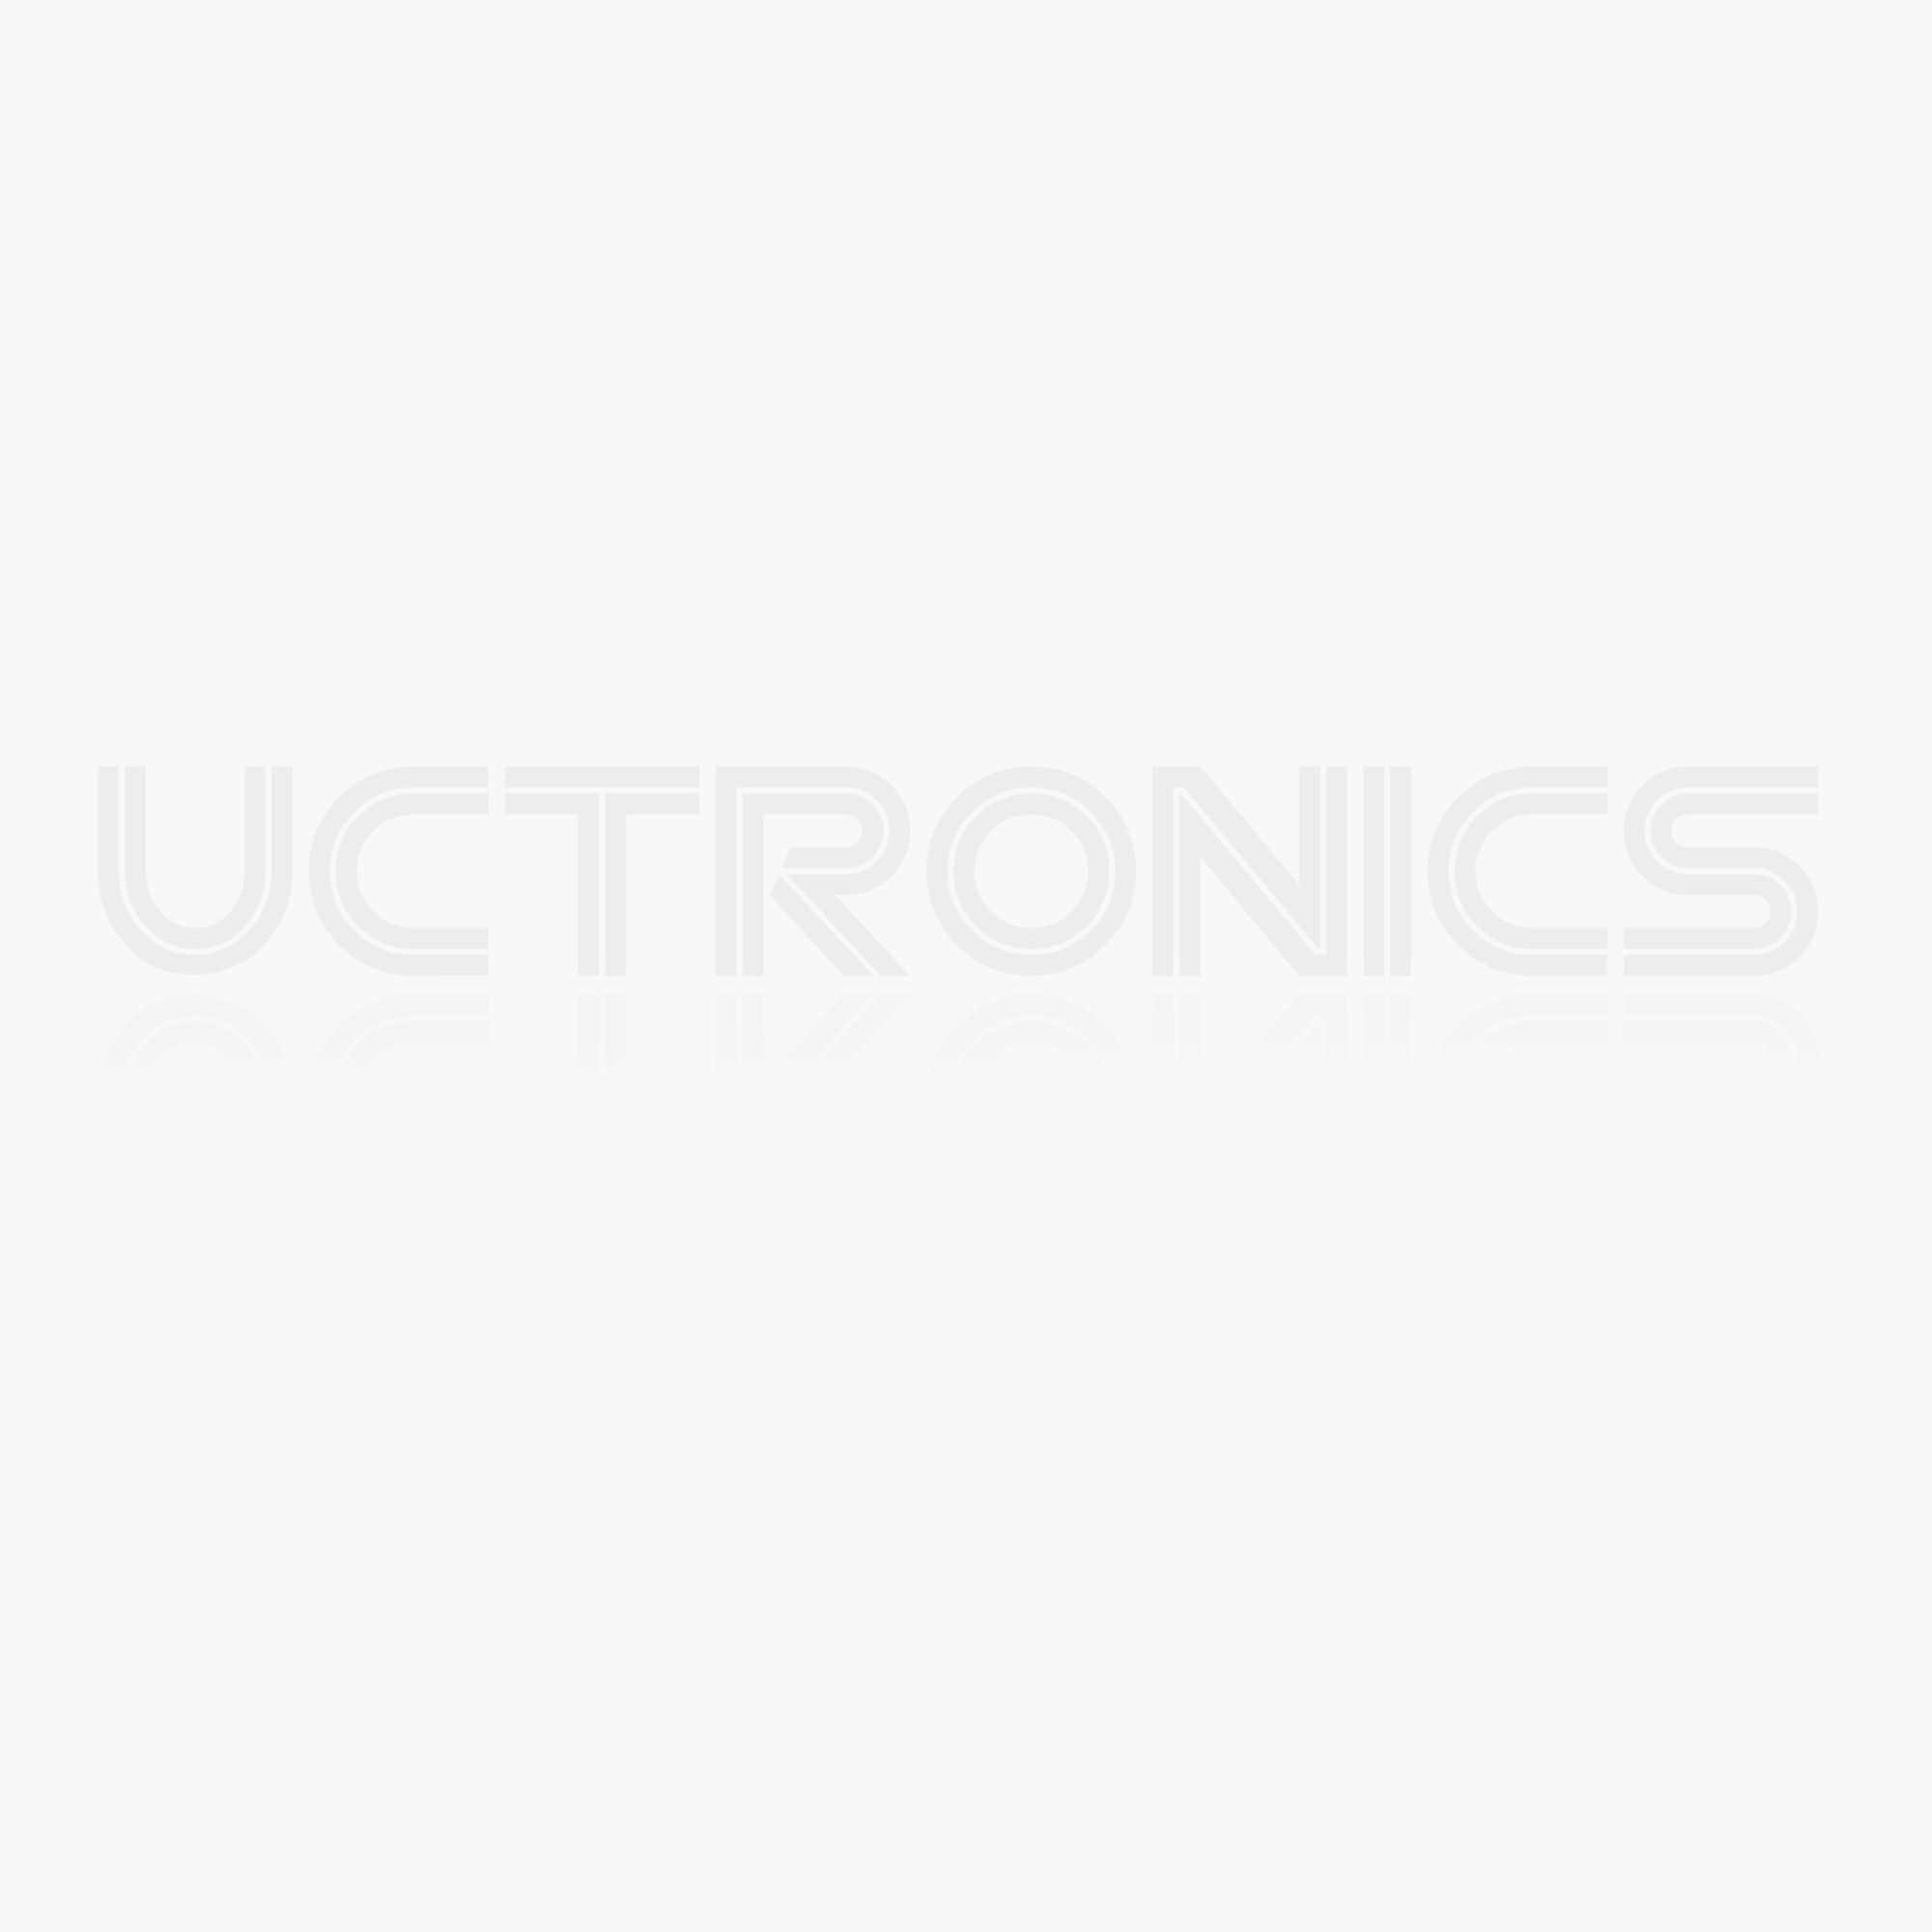 16 push buttons 4x4 Matrix Keyboard FOR Arduino AVR ARM STM32